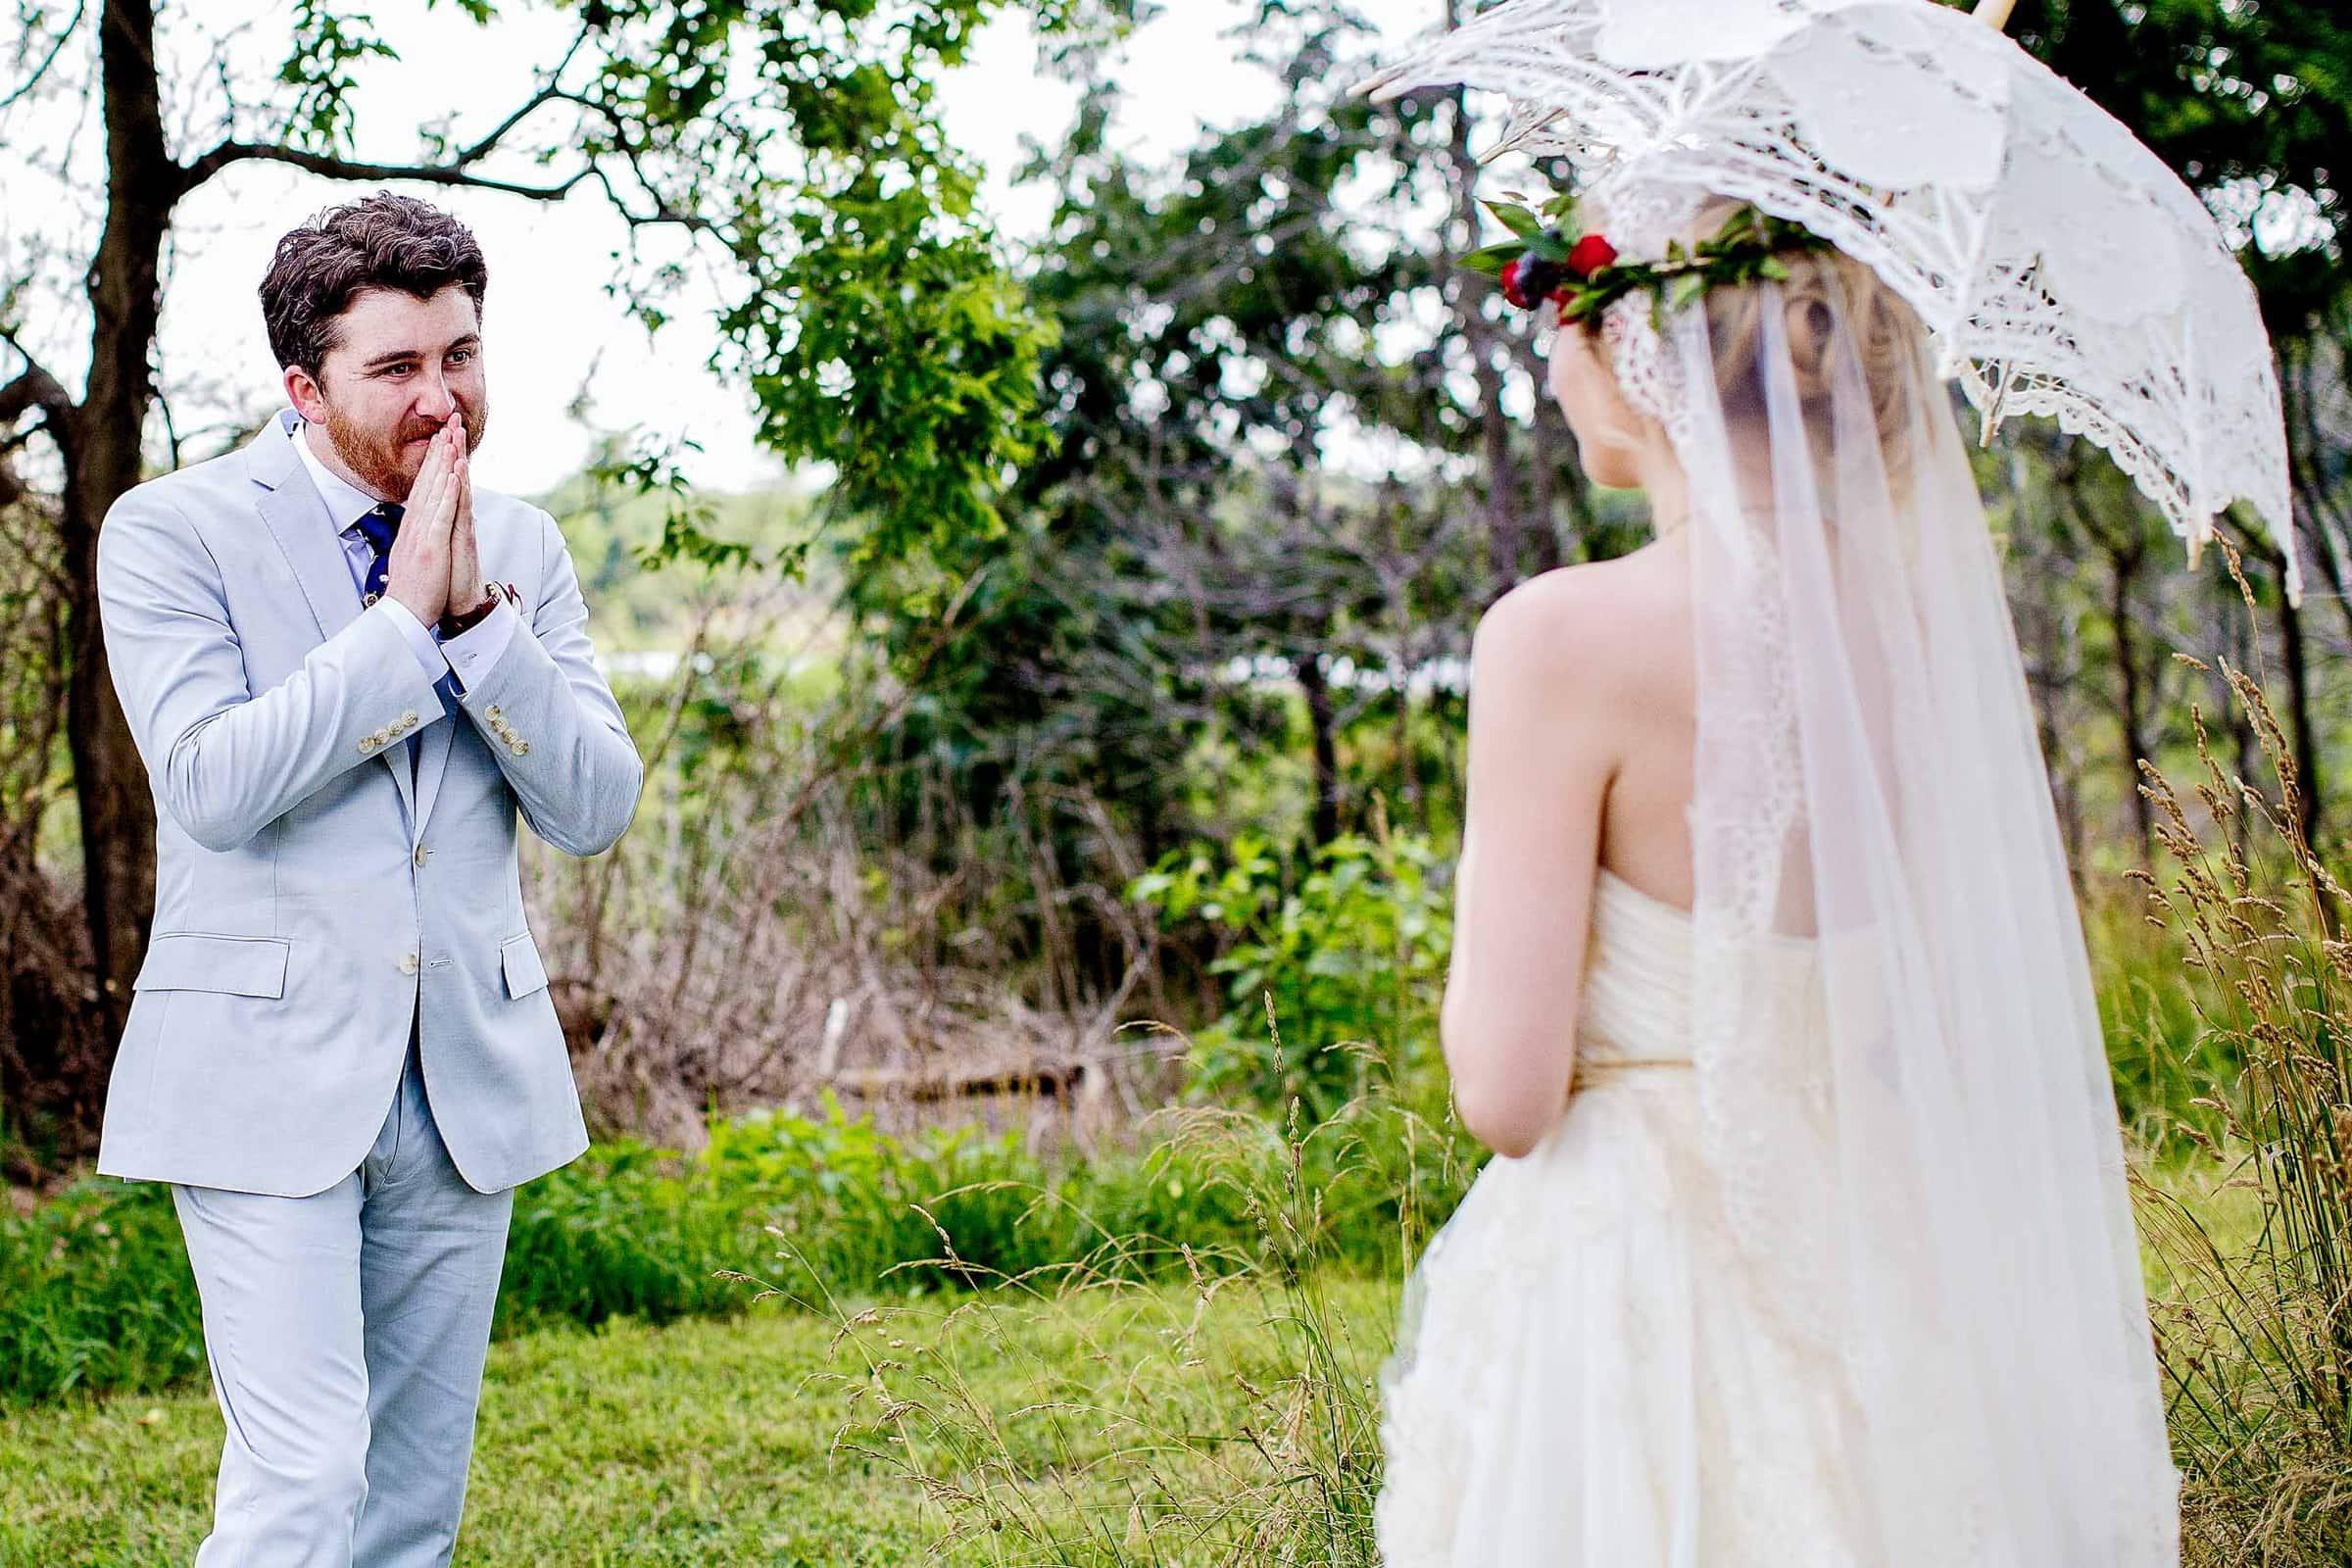 Emotional Fearless Photographers award winning wedding photo taken of Brian seeing his bride before their Chesapeake Bay wedding in Maryland at Wades Point Inn.